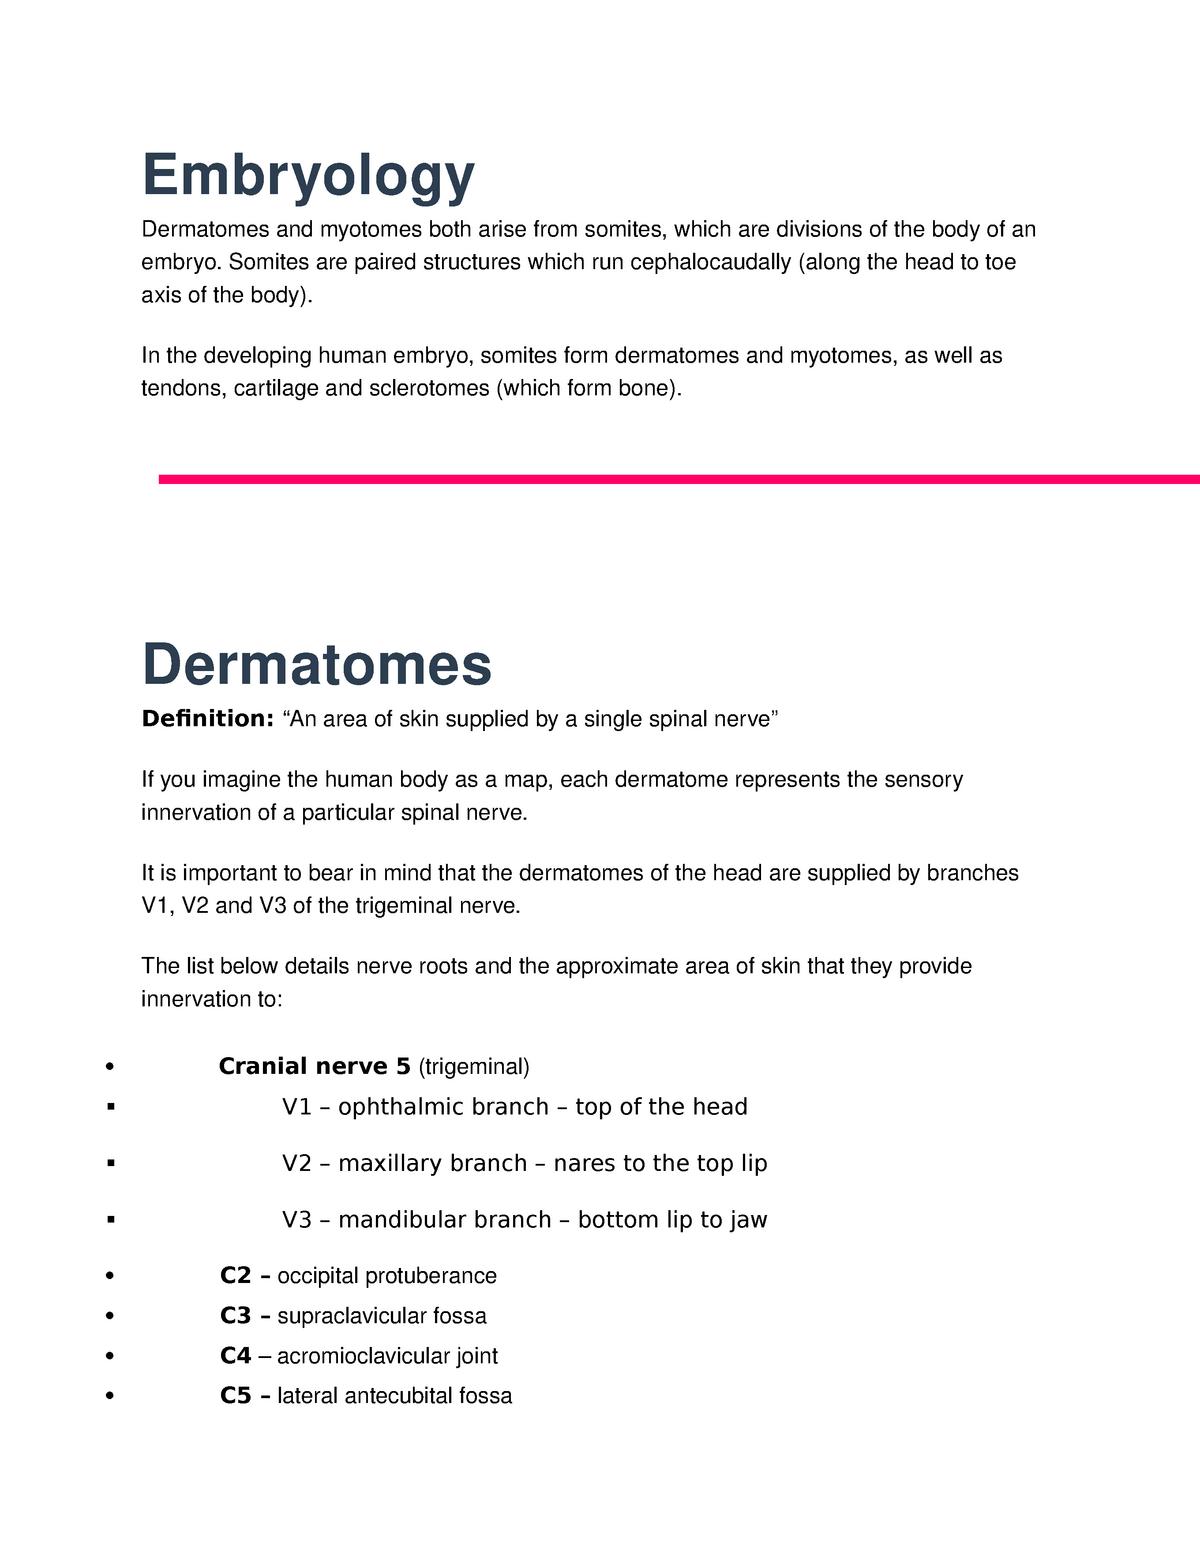 Dermatomes And Myotomes Summary Md1020 Studocu